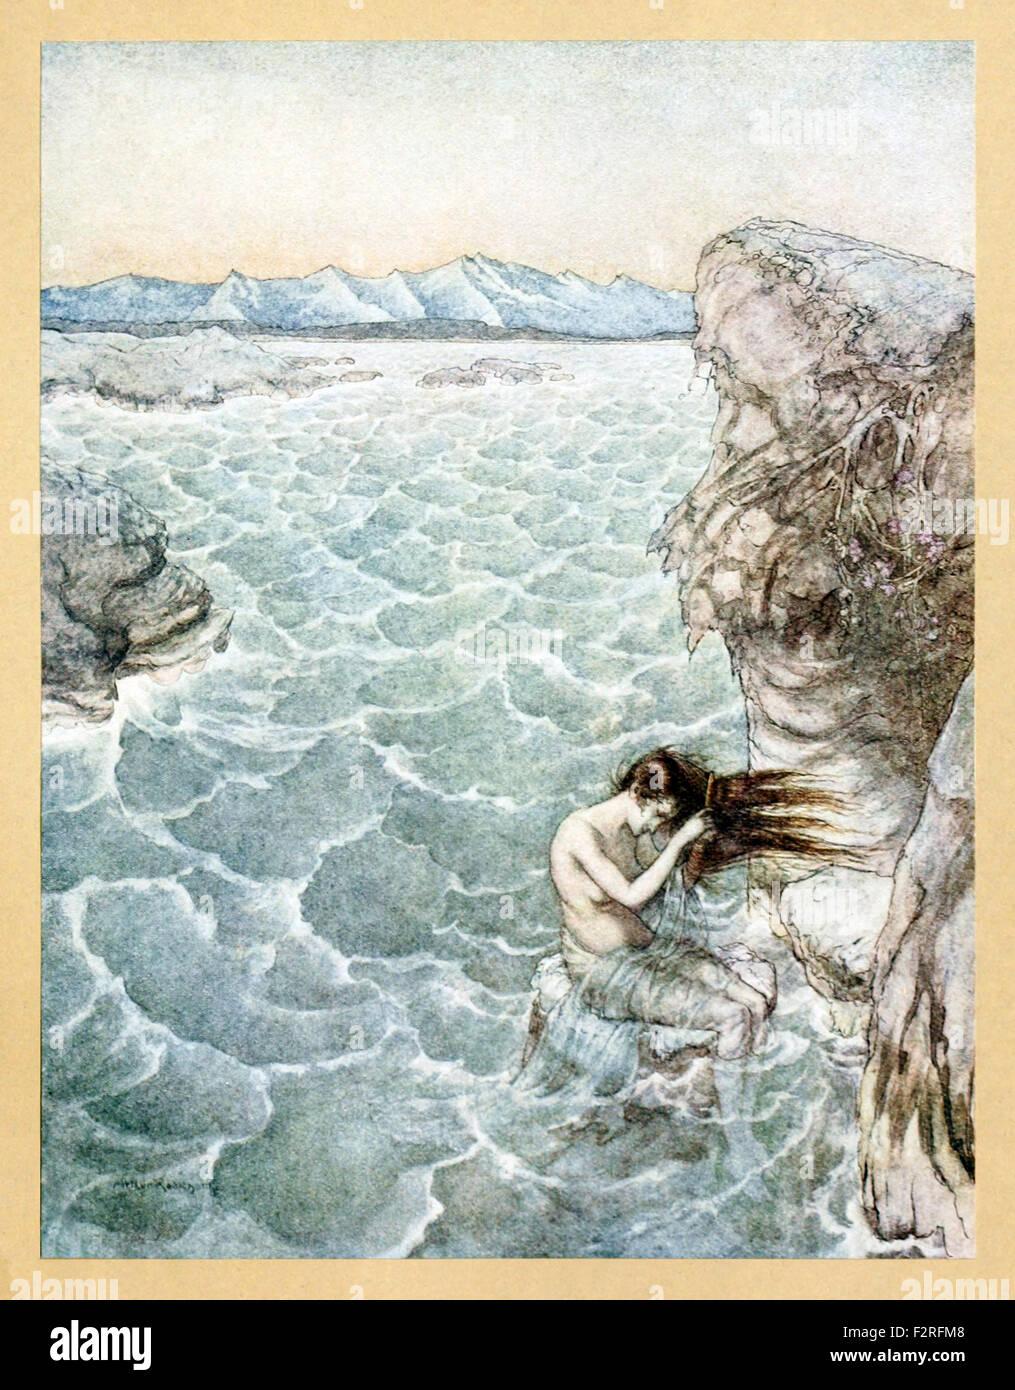 'Fair Ligea' from 'Comus' by John Milton, illustration by Arthur Rackham (1867-1939). See description - Stock Image